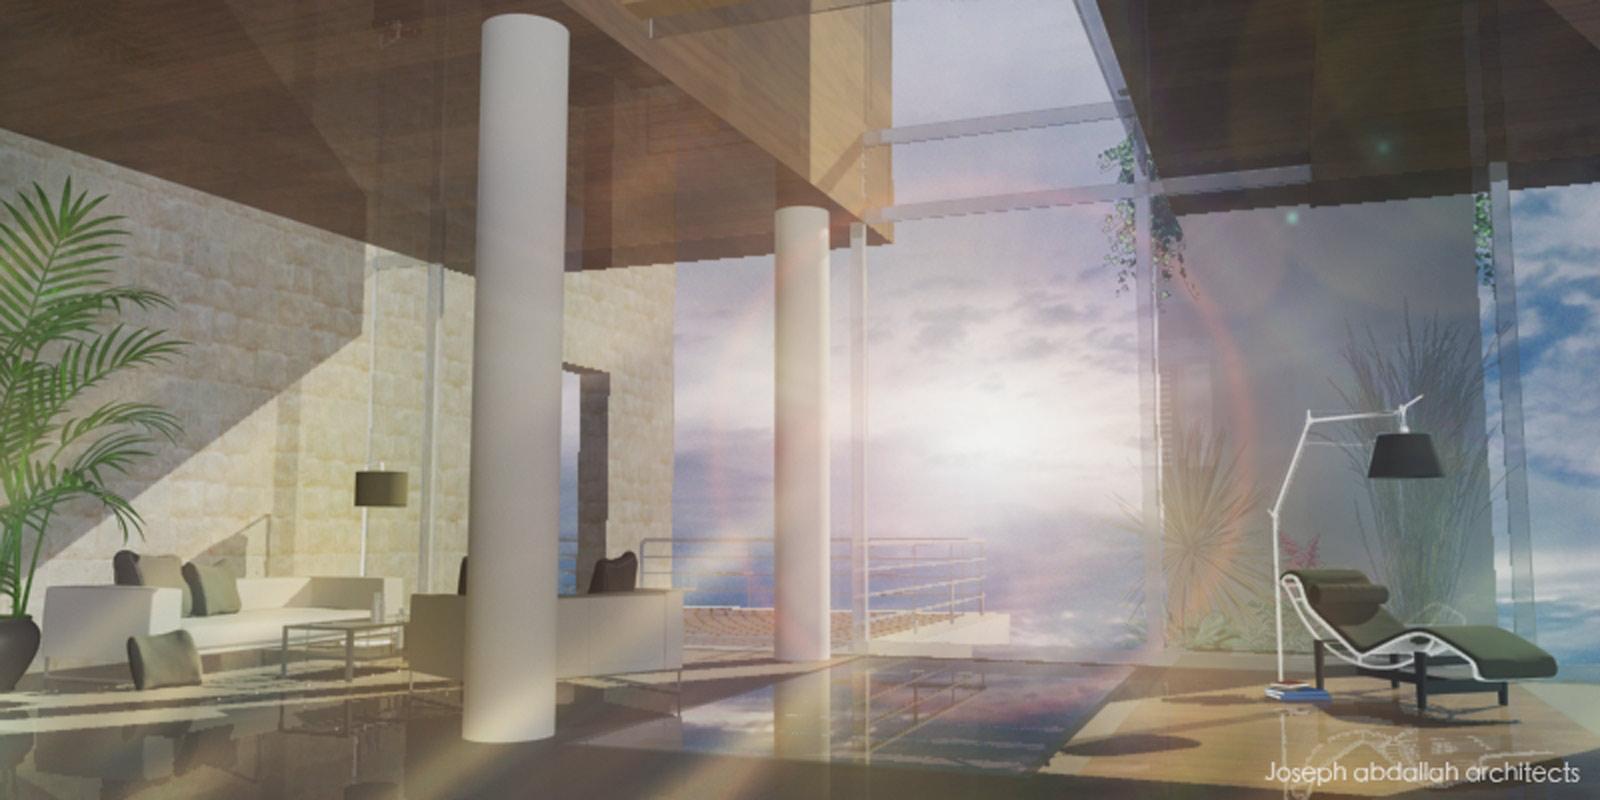 transparent-view-villa-modern-archiecture-joseph-abdallah-architects-5